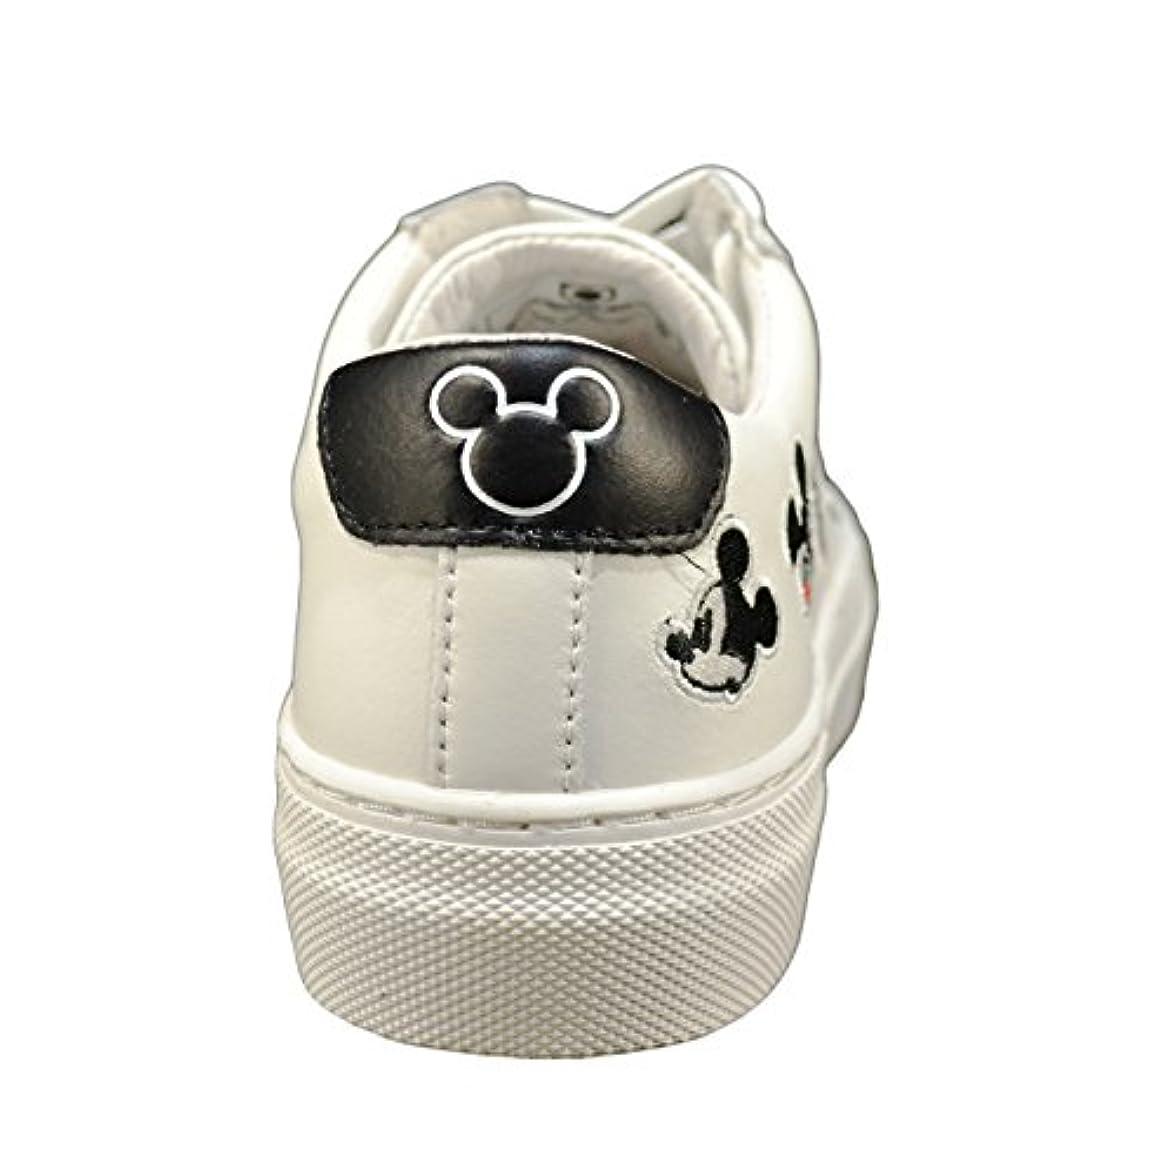 Moa Master Of Arts Scarpe Sneakers Donna In Pelle Nuove Mickey Bianco Eu 41 Md160